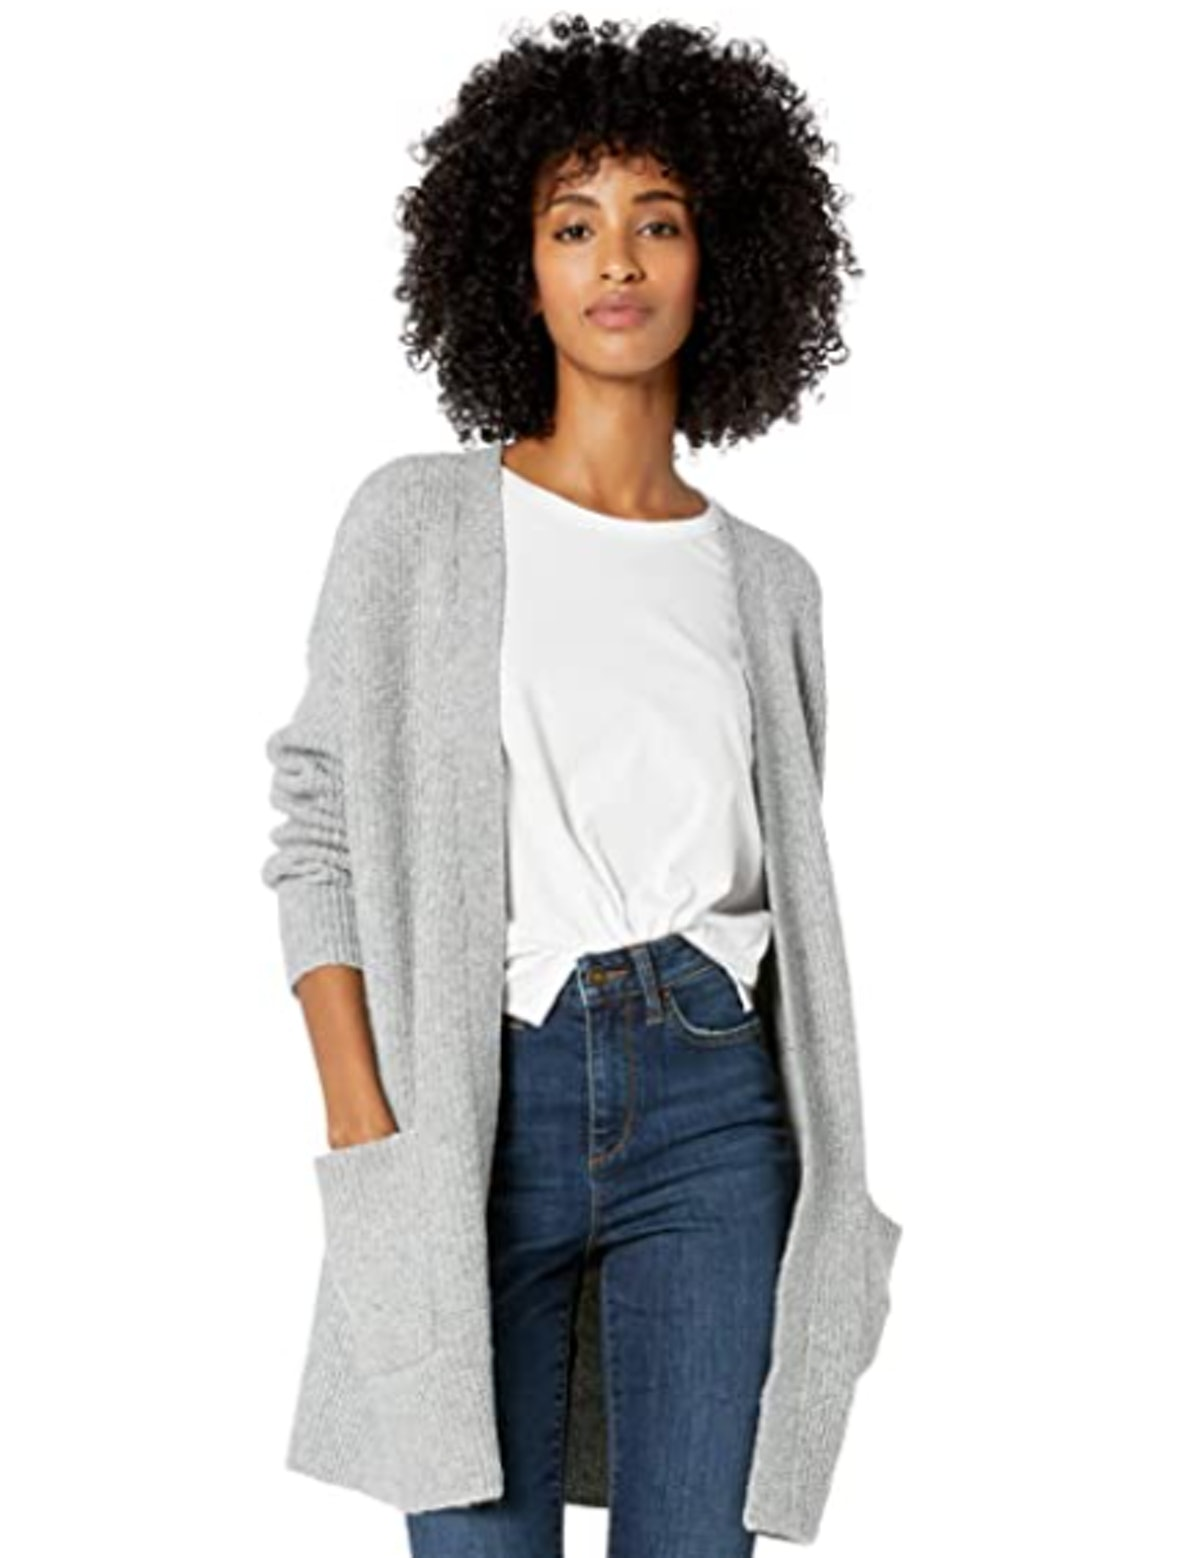 Goodthreads Women's Boucle Shaker Stitch Cardigan Sweater